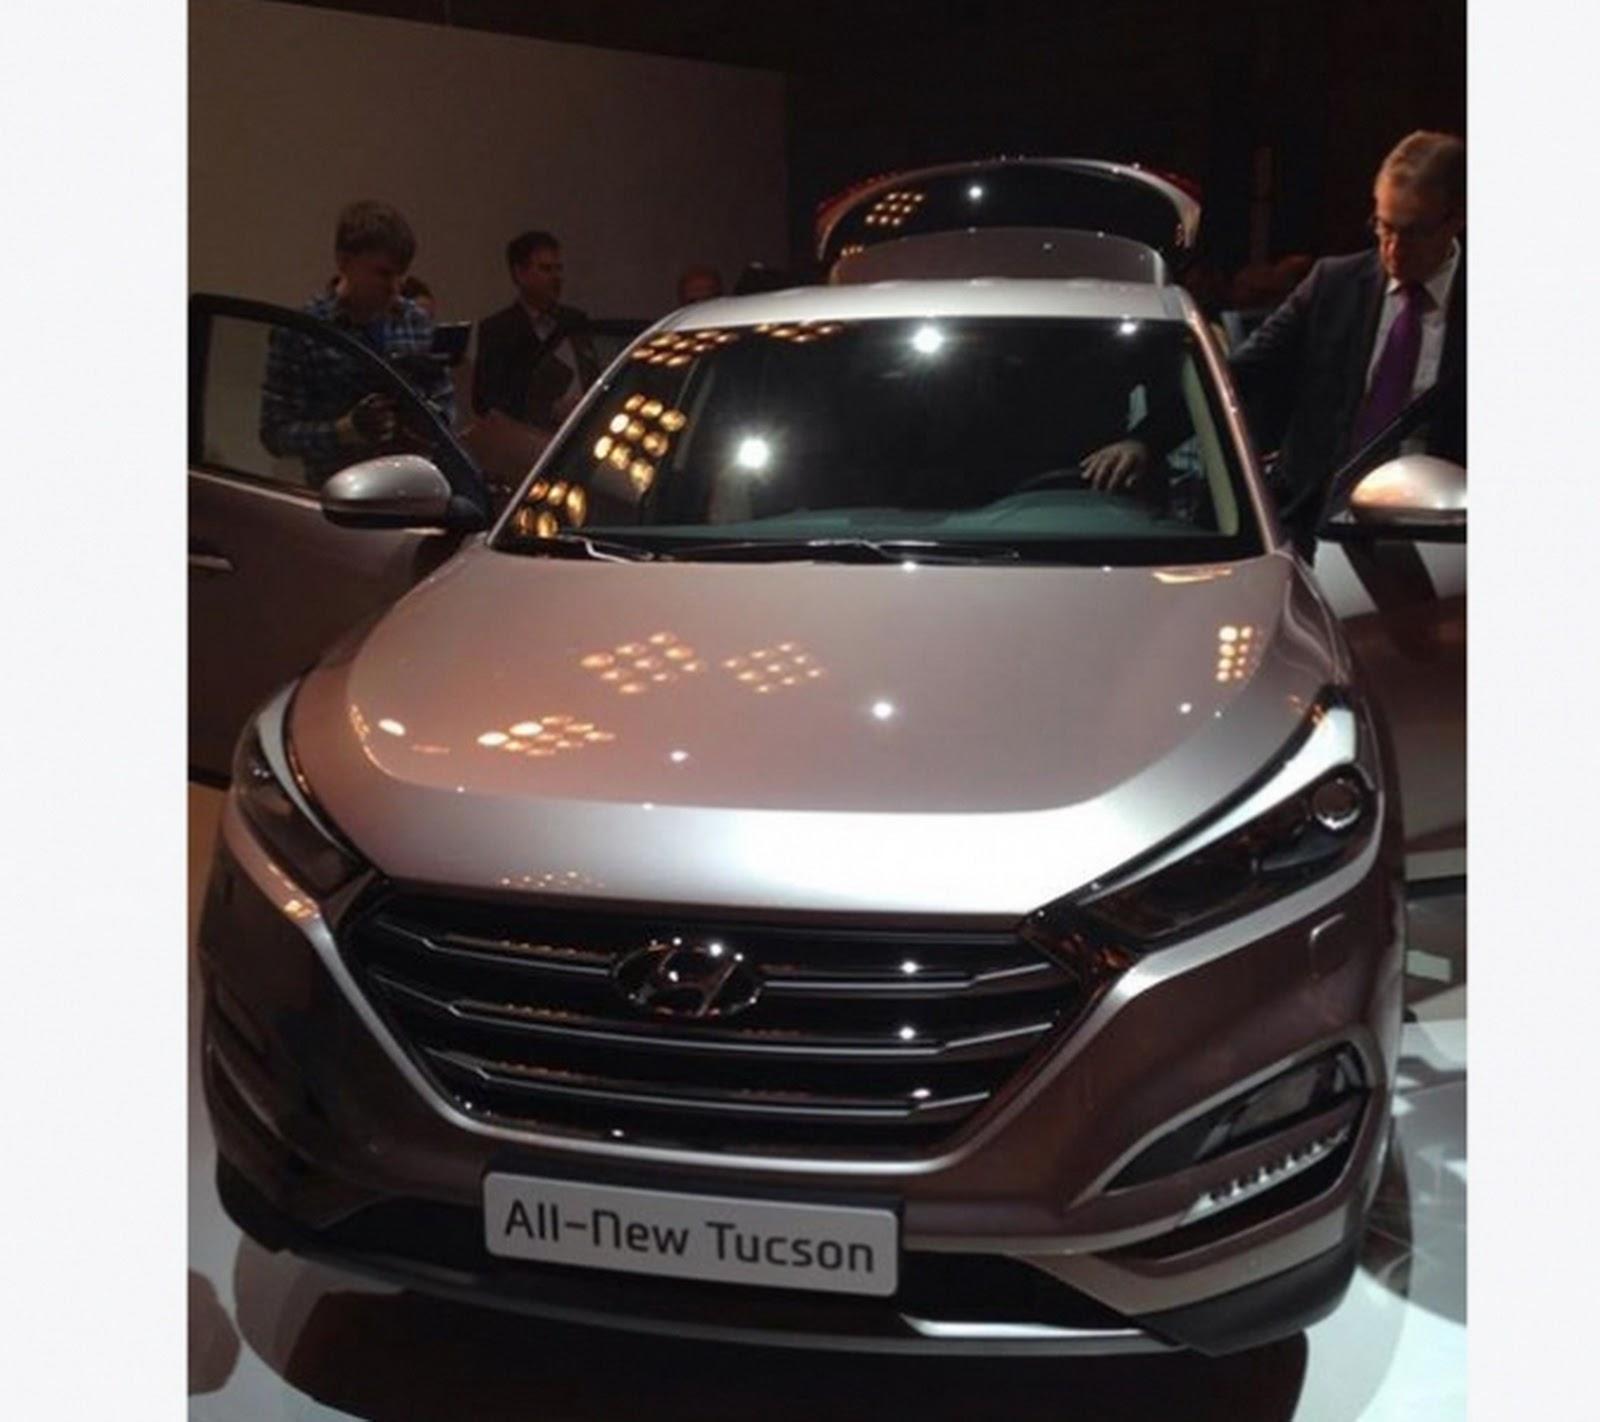 Tuson Hyundai: First Photos Of All-New 2016 Hyundai Tucson